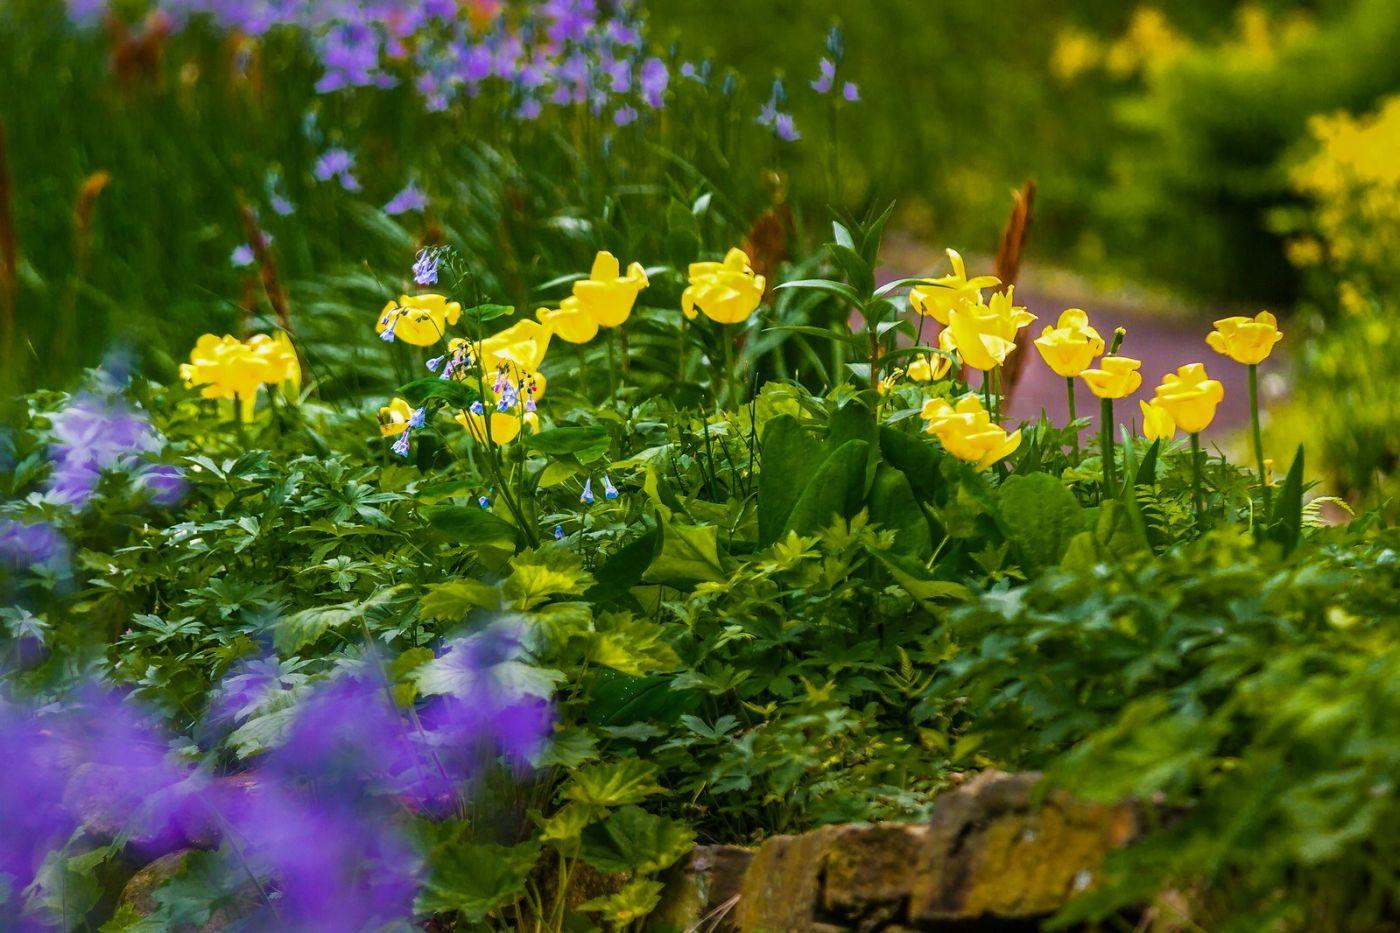 Chanticleer花园,有梦想的季节_图1-14